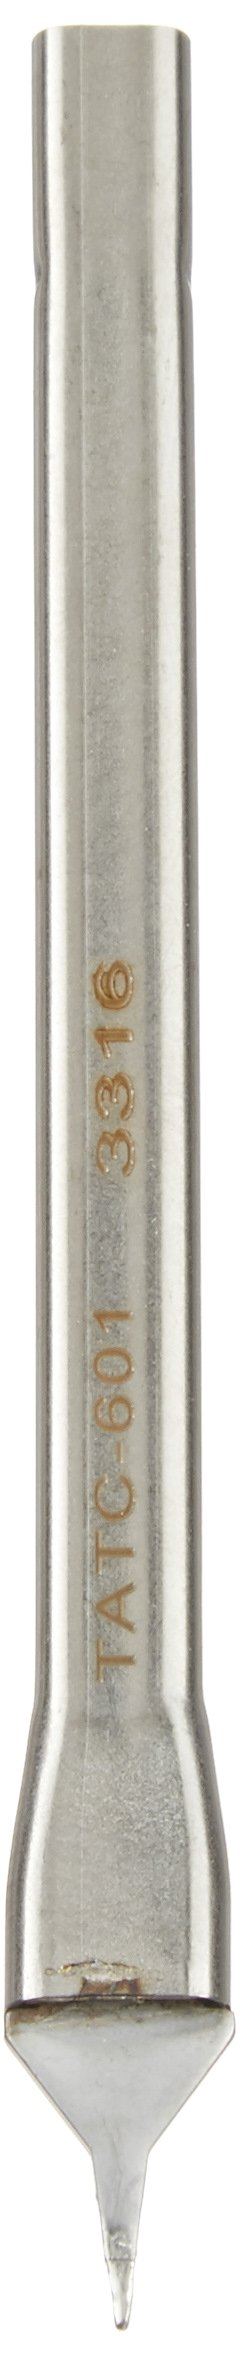 Metcal TATC-601 Series TATC Talon Cartridge for Temperature Sensitive Applications, 675°F Maximum Tip Temperature, Fine Point, 0.5mm Tip Size, 12.45mm Tip Length, 0.35mm Tip Thickness